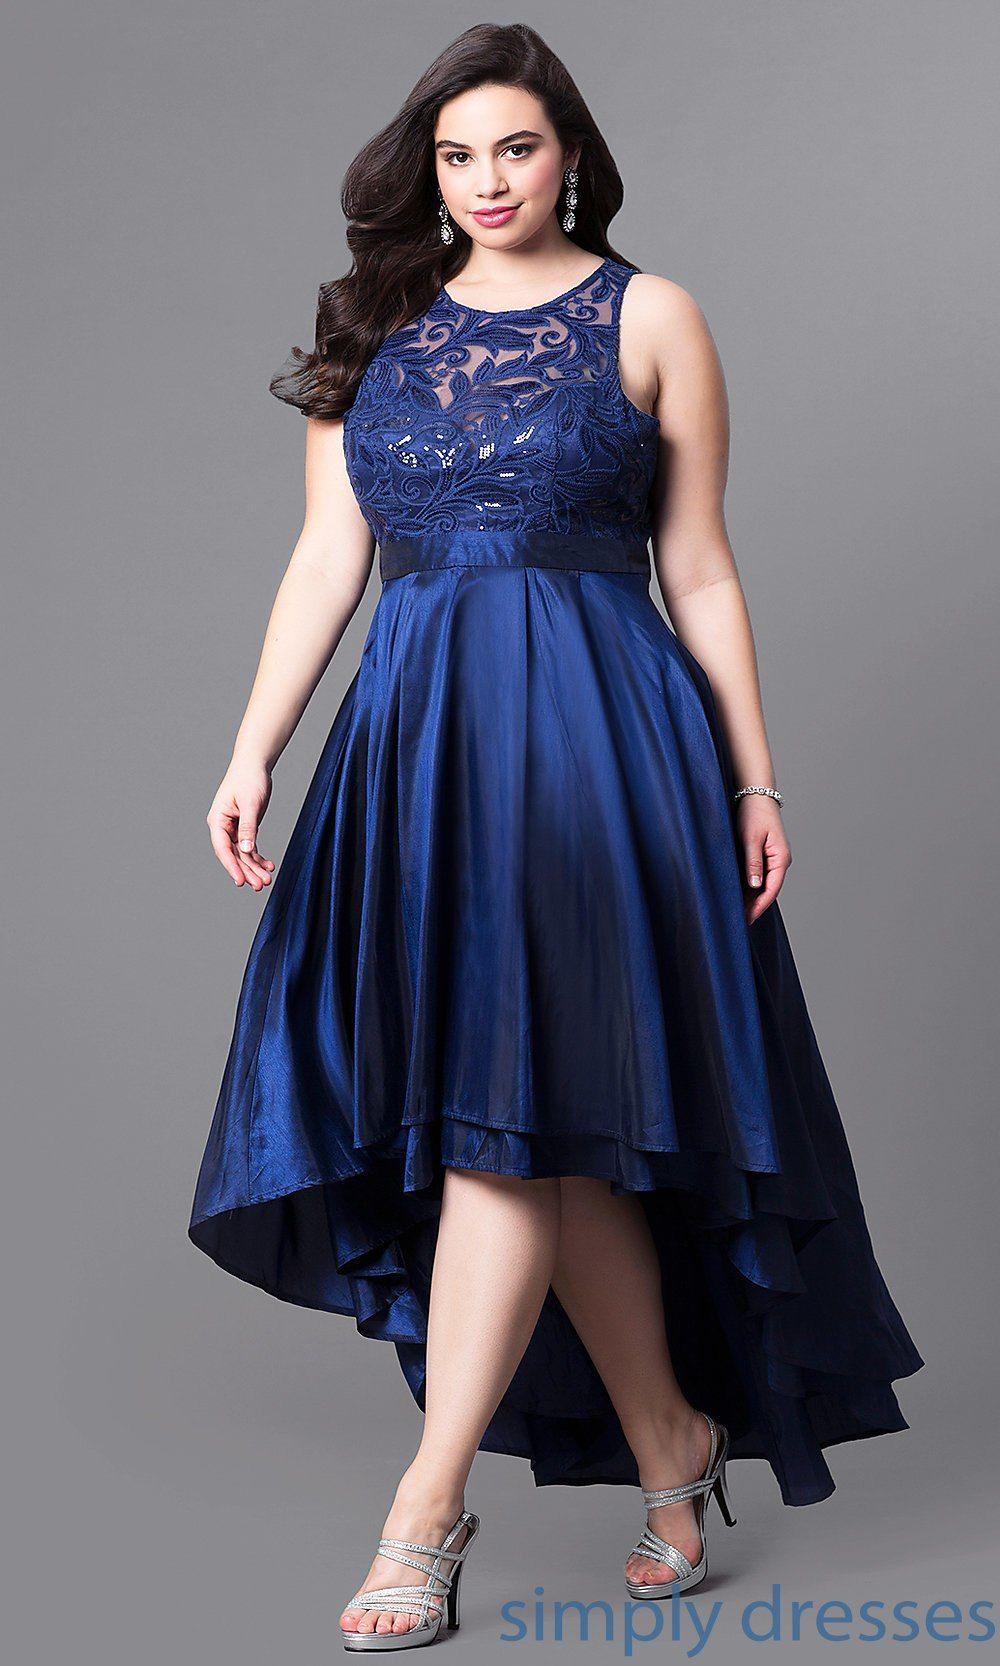 Shop satin plus-size prom dresses at Simply Dresses ...